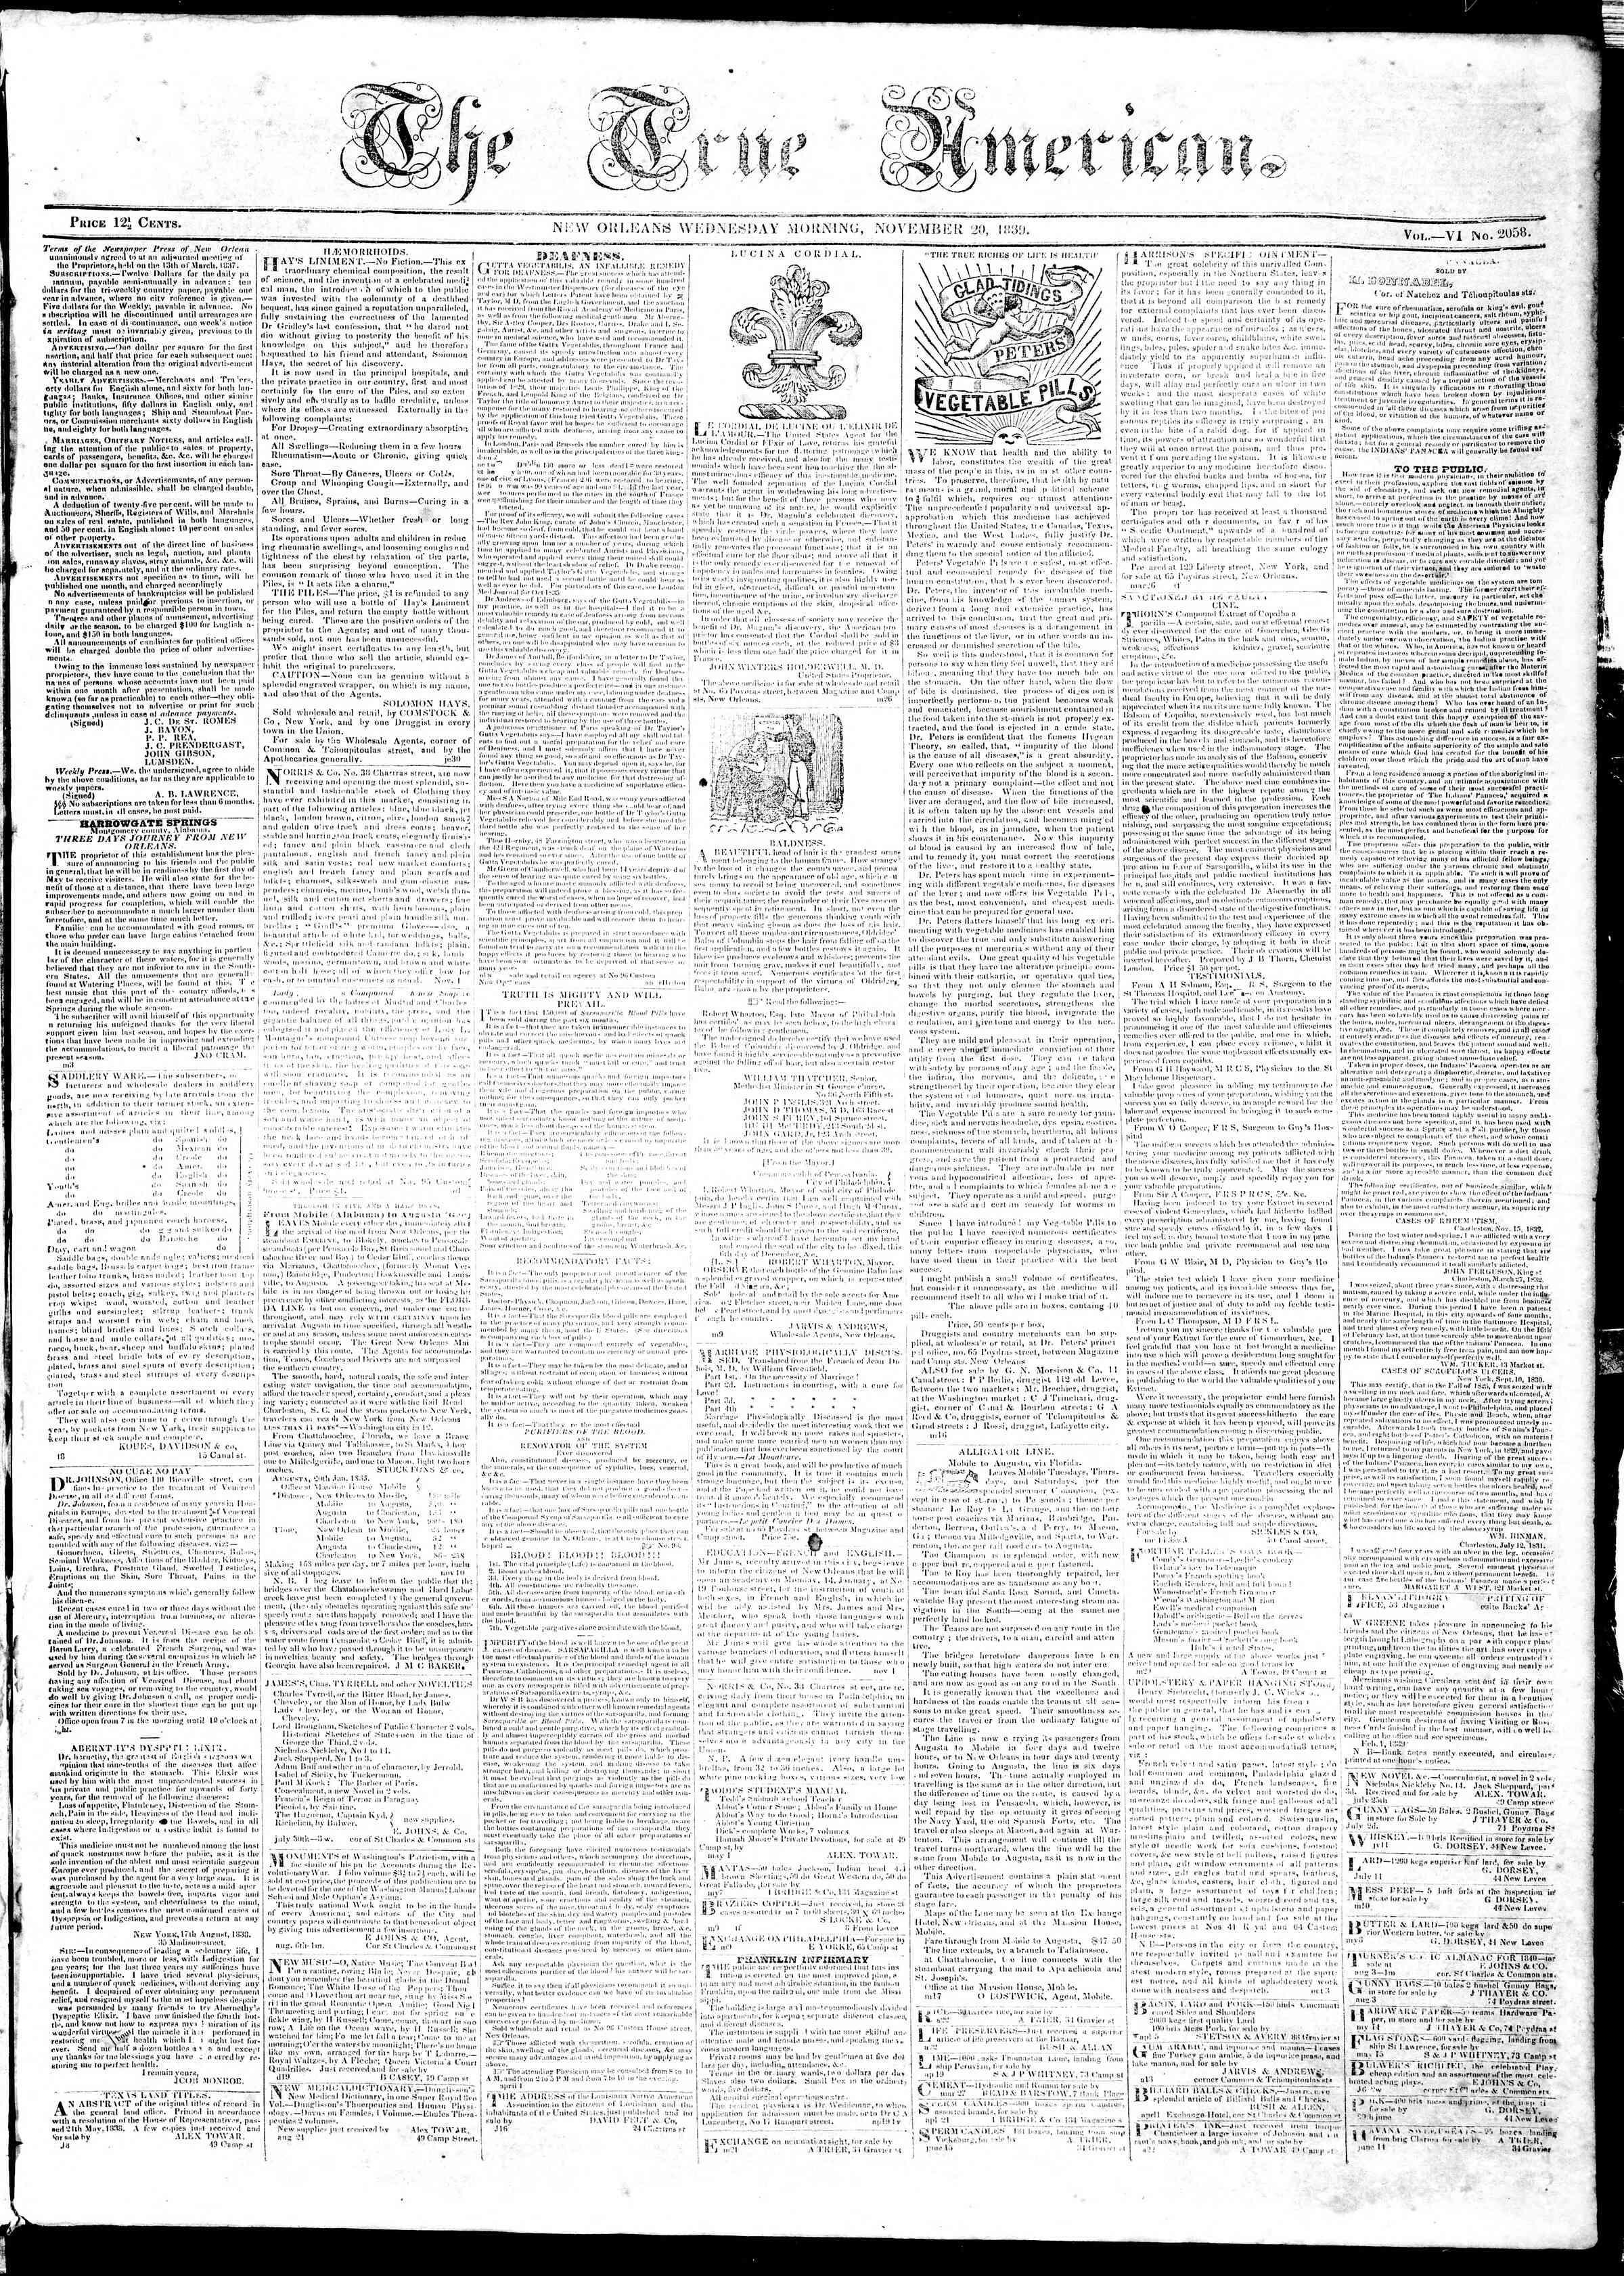 November 20, 1839 Tarihli True American Gazetesi Sayfa 1